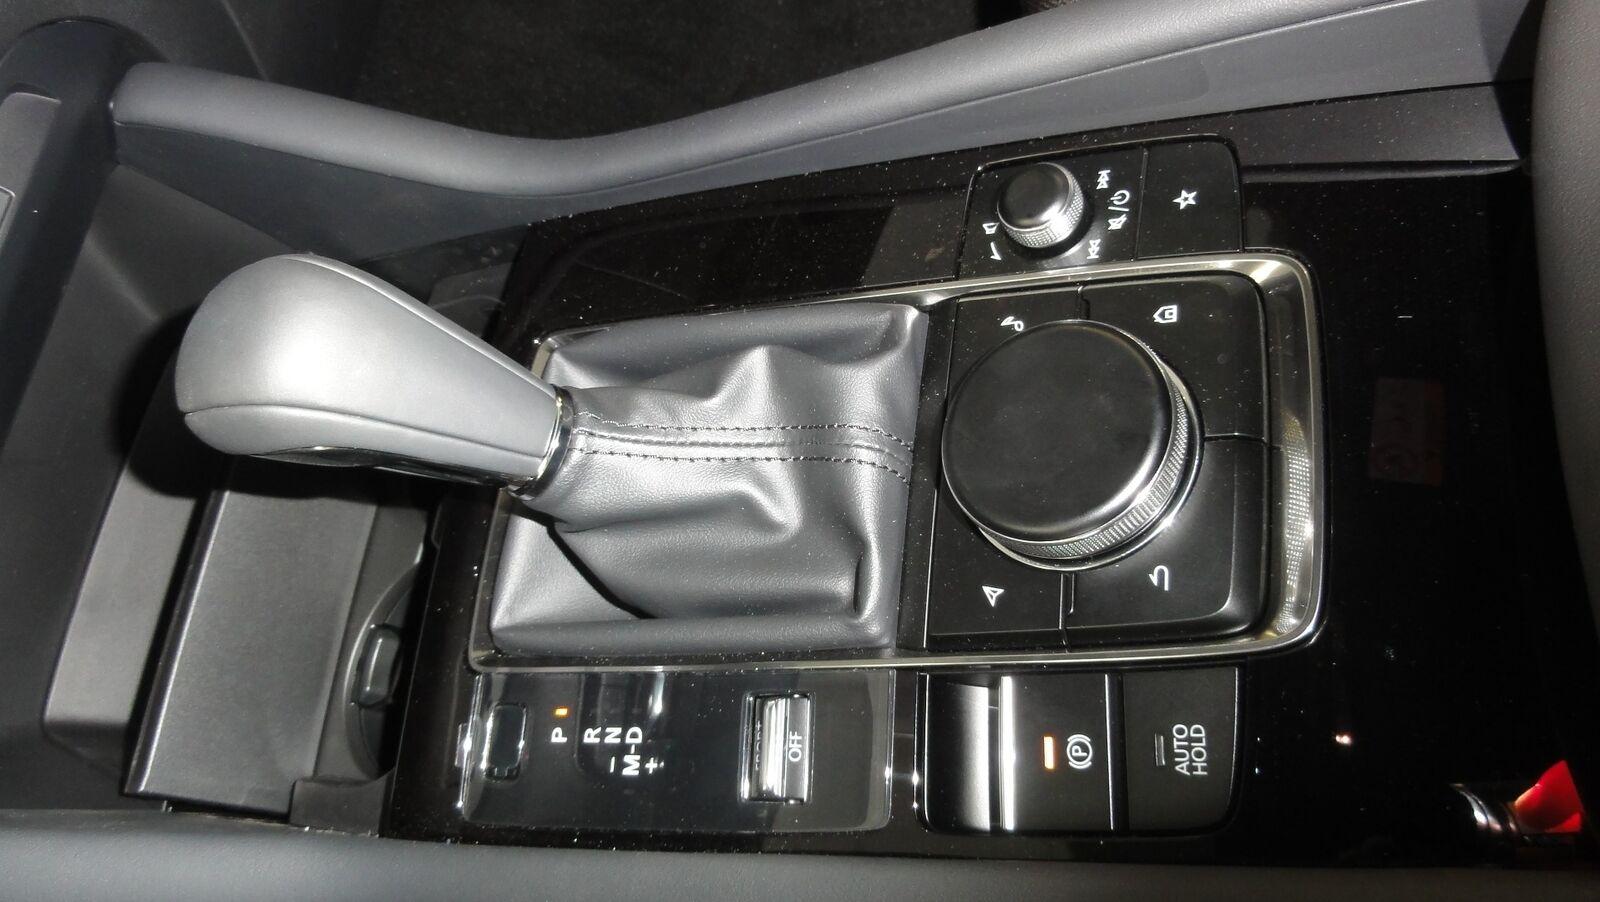 Mazda 3 2,0 Sky-G 150 Sky aut. - billede 10